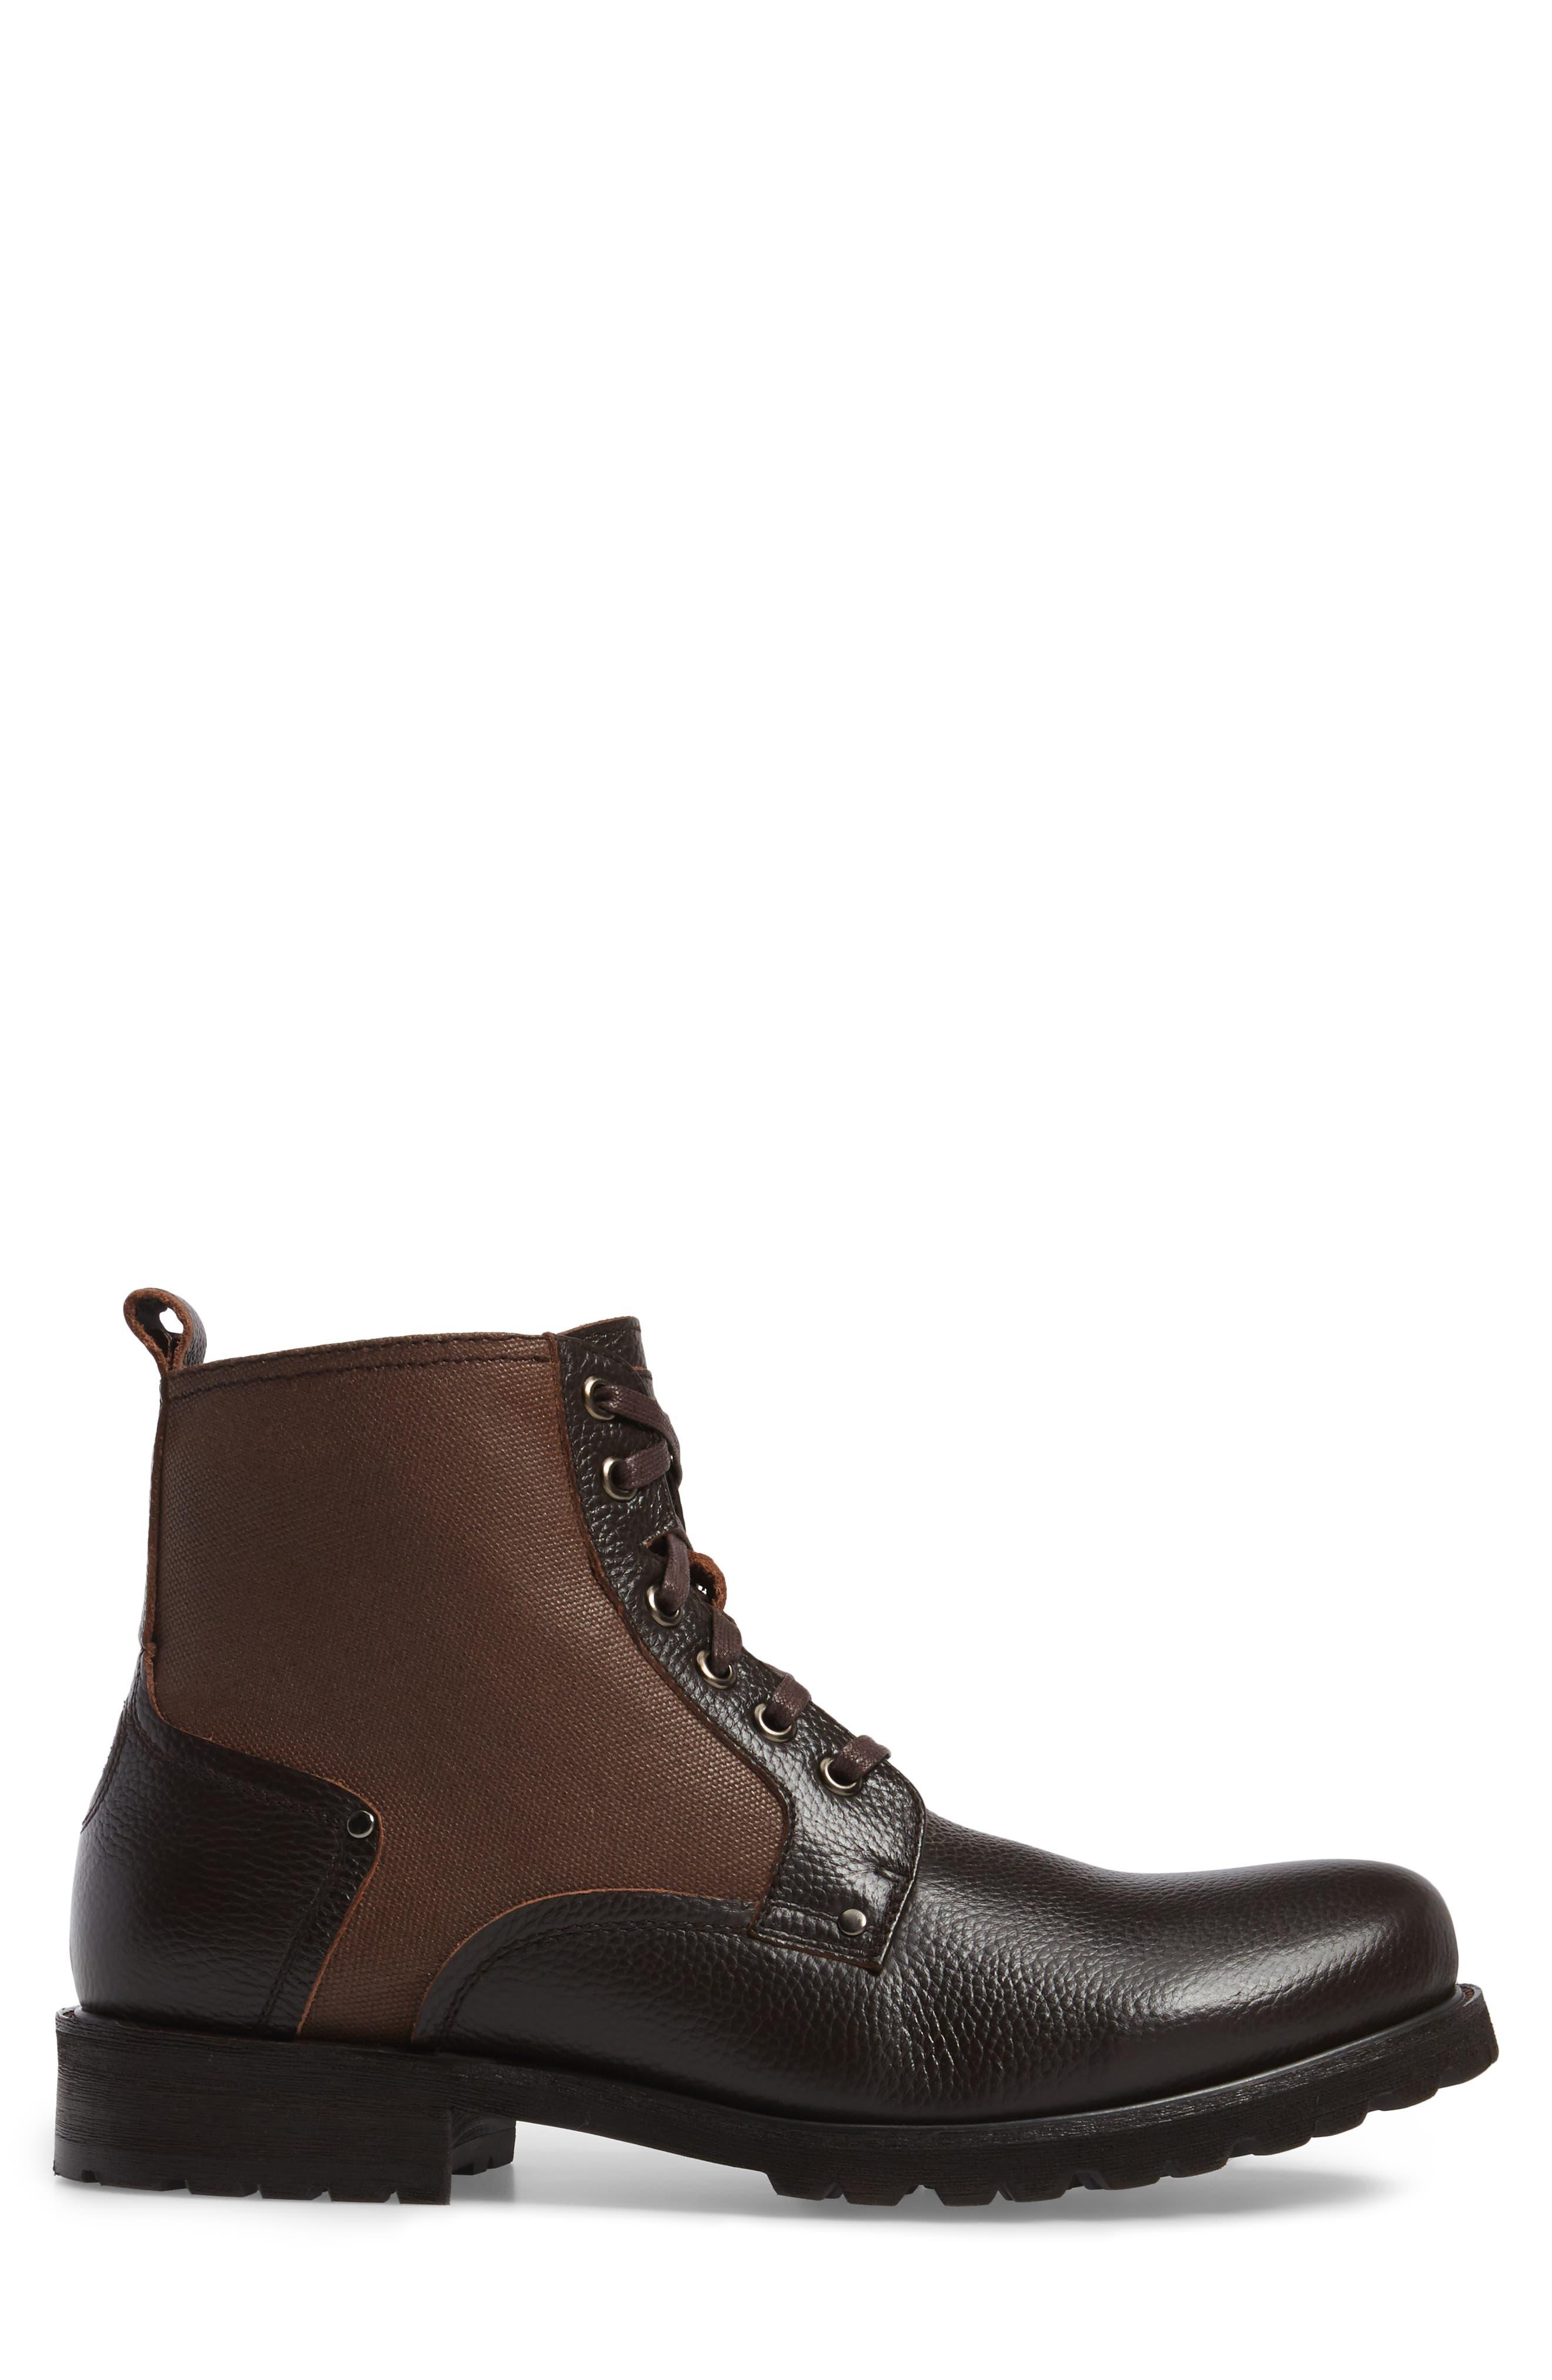 Whitley Plain Toe Boot,                             Alternate thumbnail 6, color,